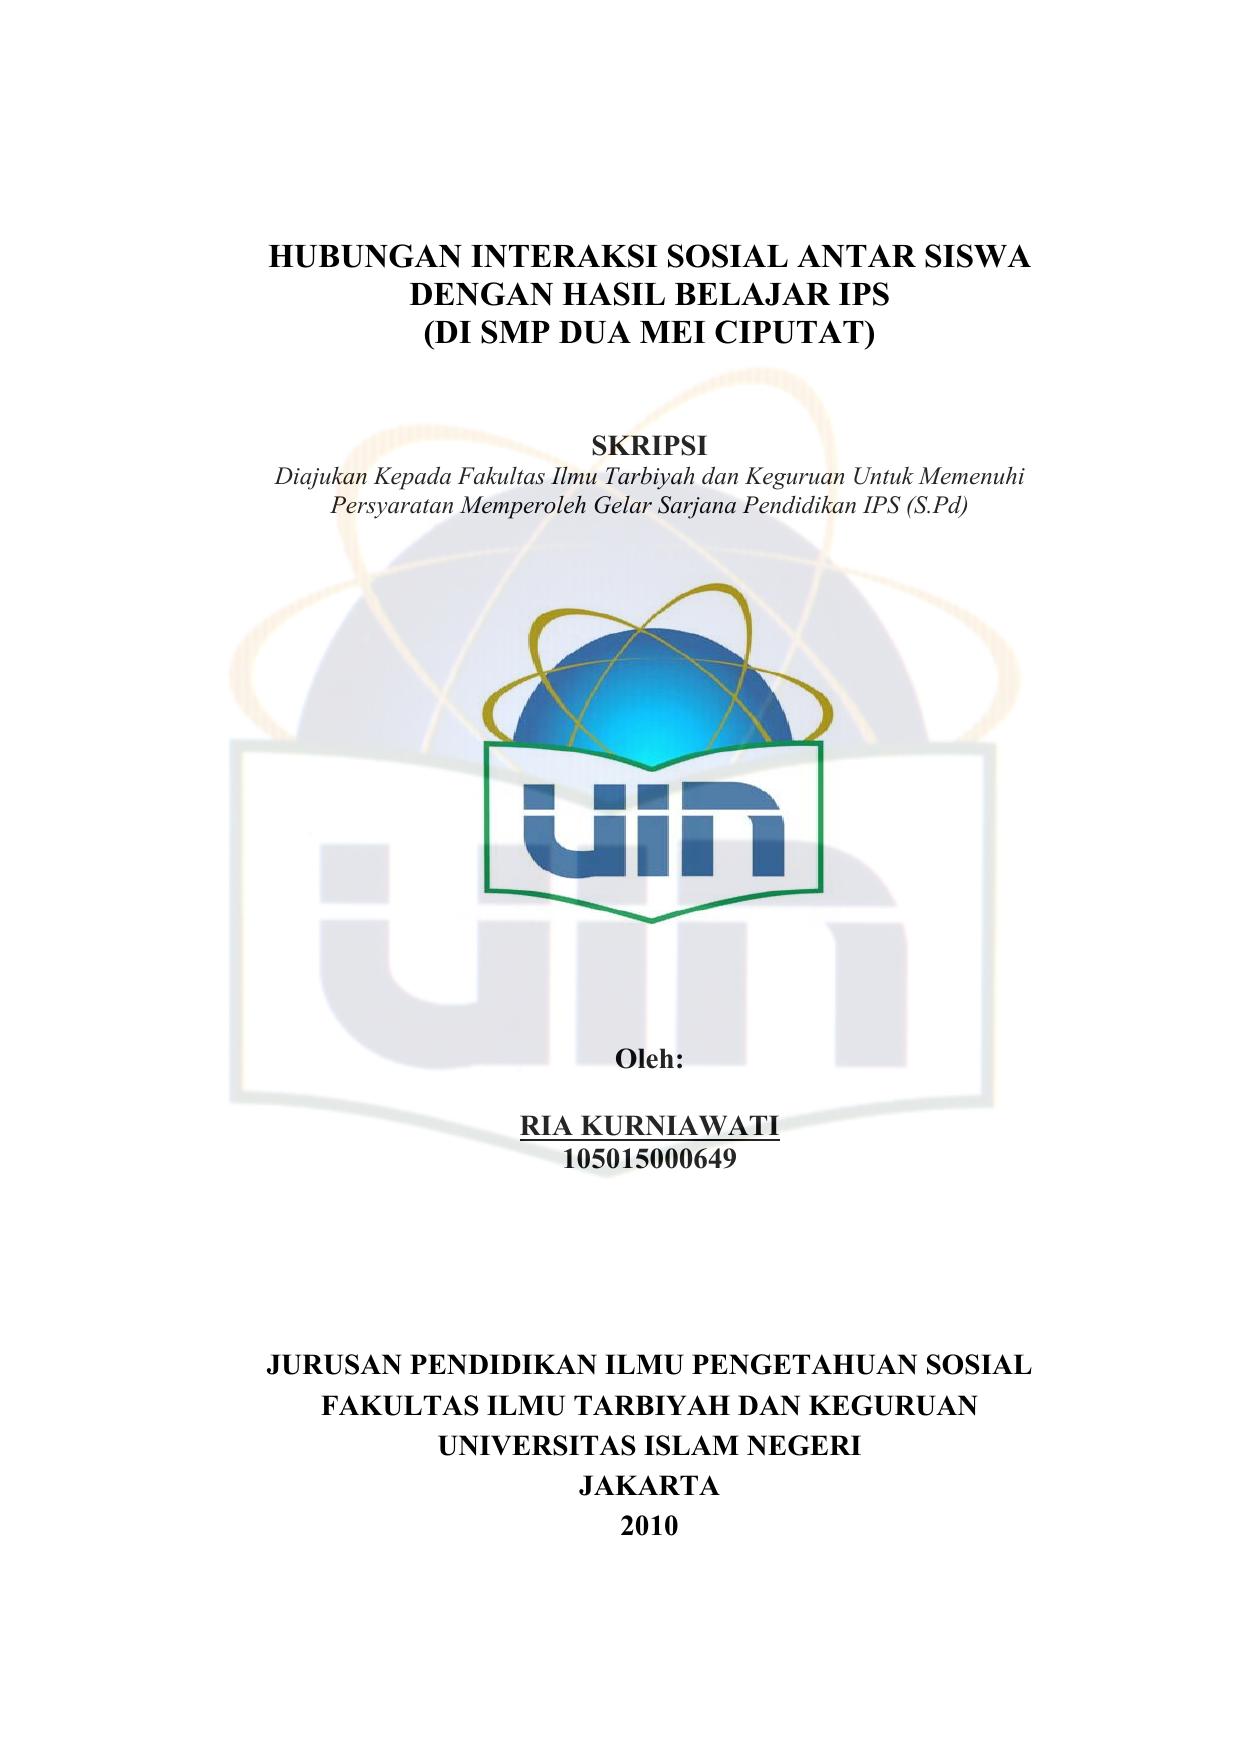 Skripsi Uin Jakarta Ide Judul Skripsi Universitas